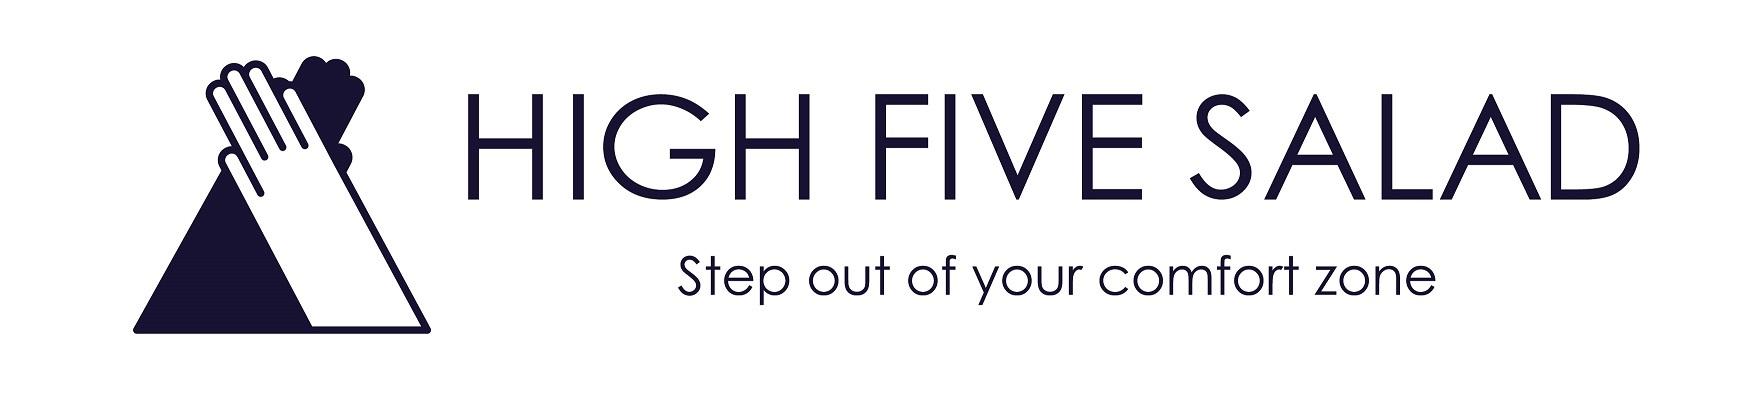 HIGH FIVE SALAD